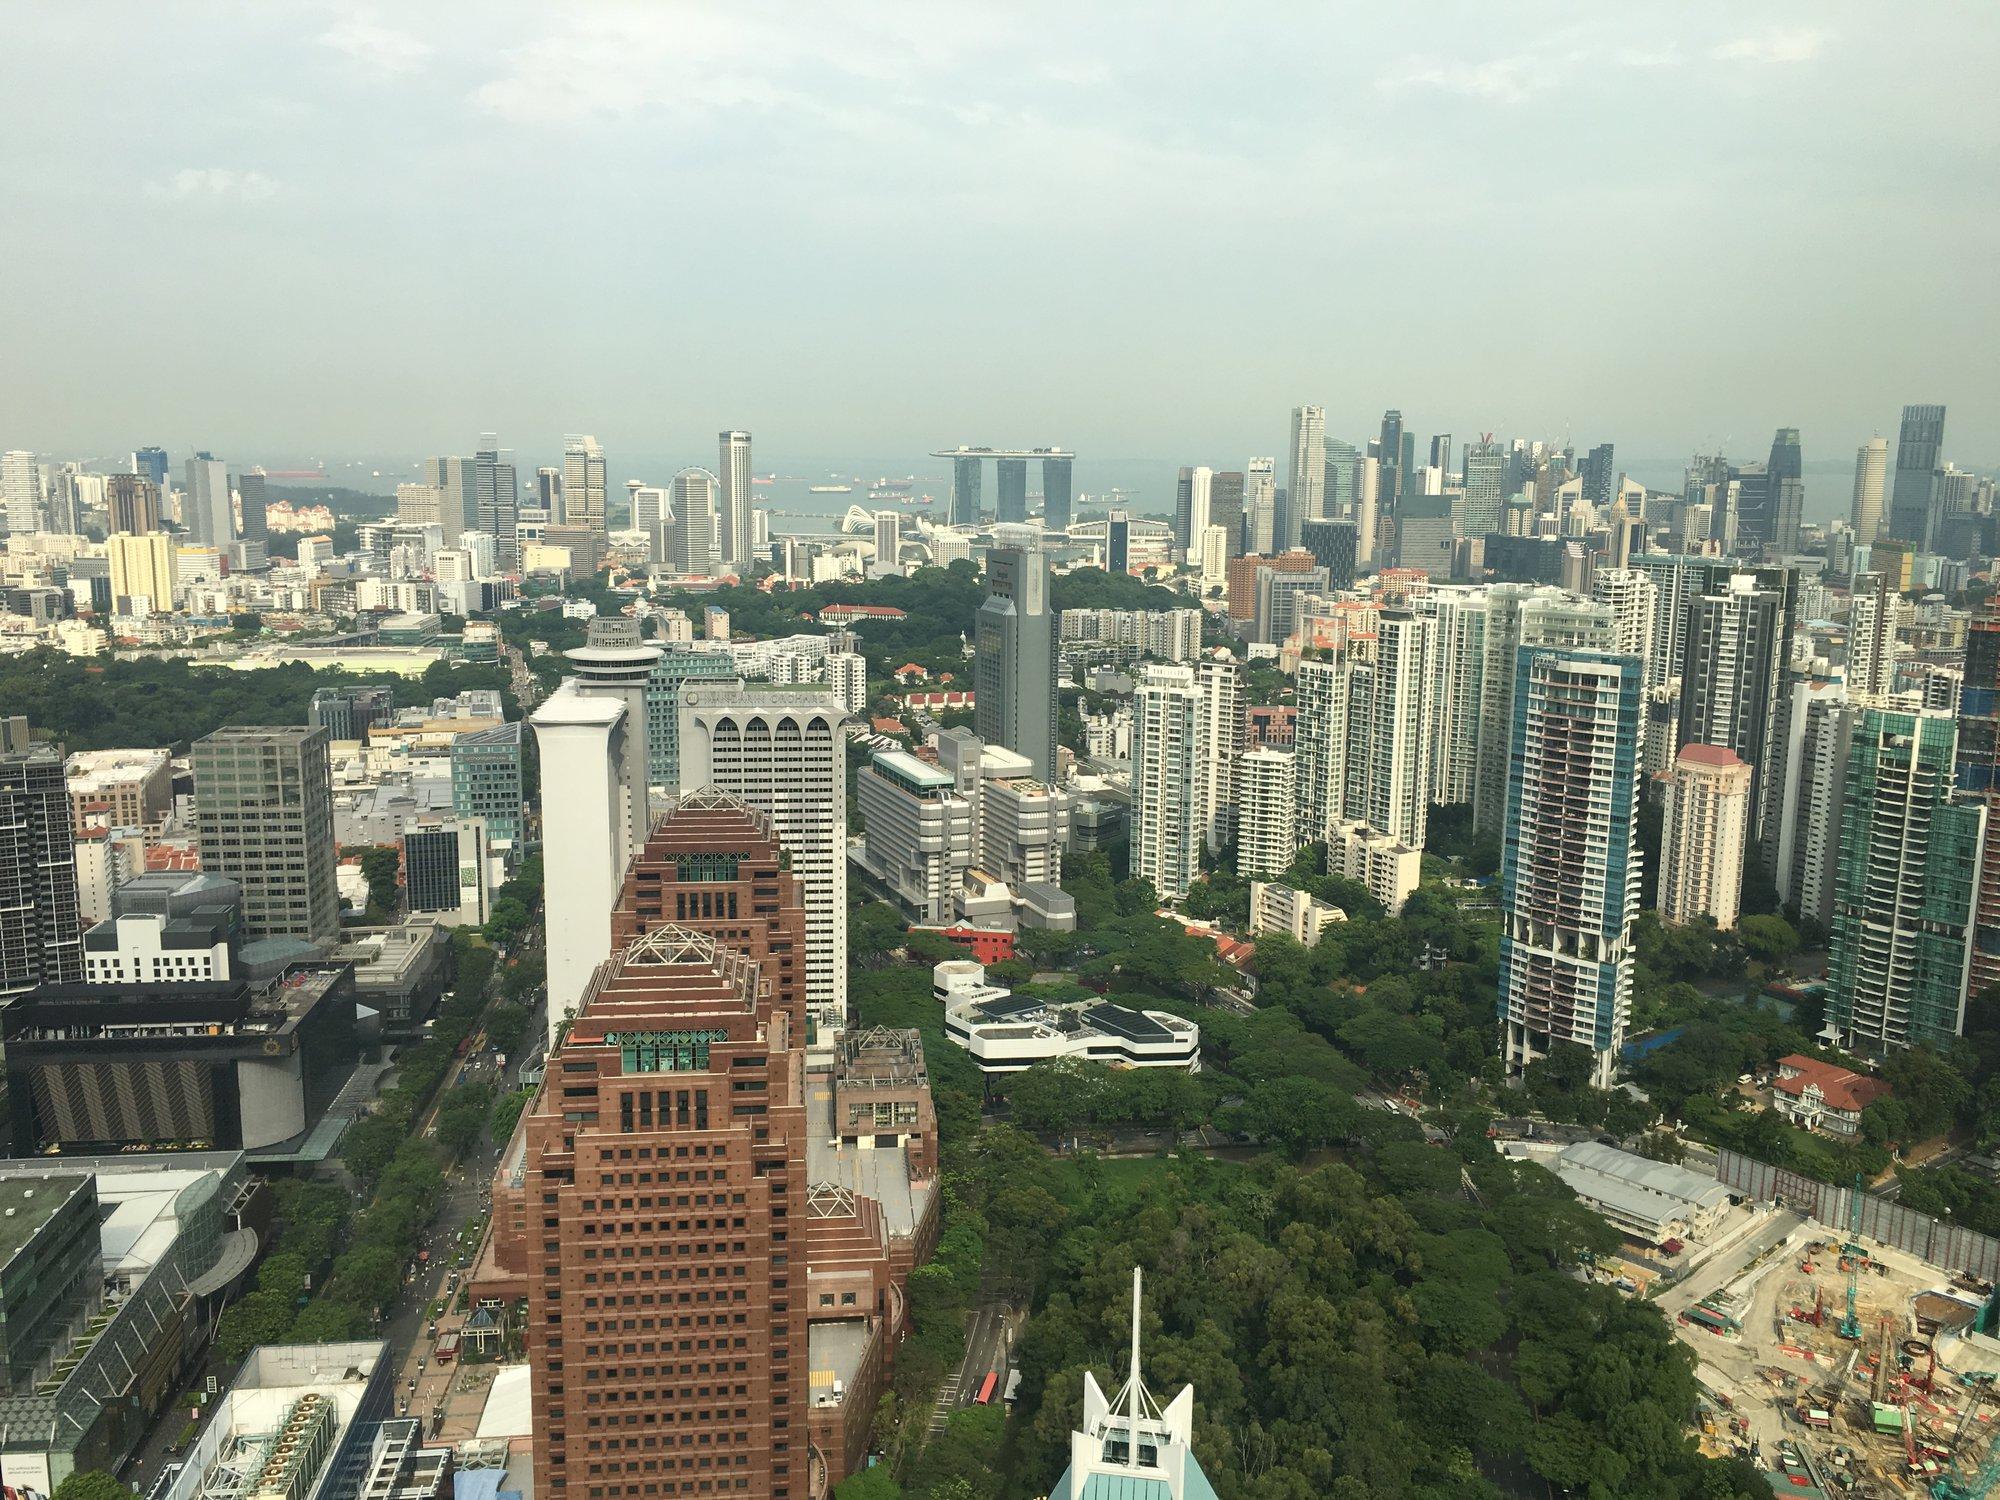 výhled na Singapur z mrakodrapu ION Orchard